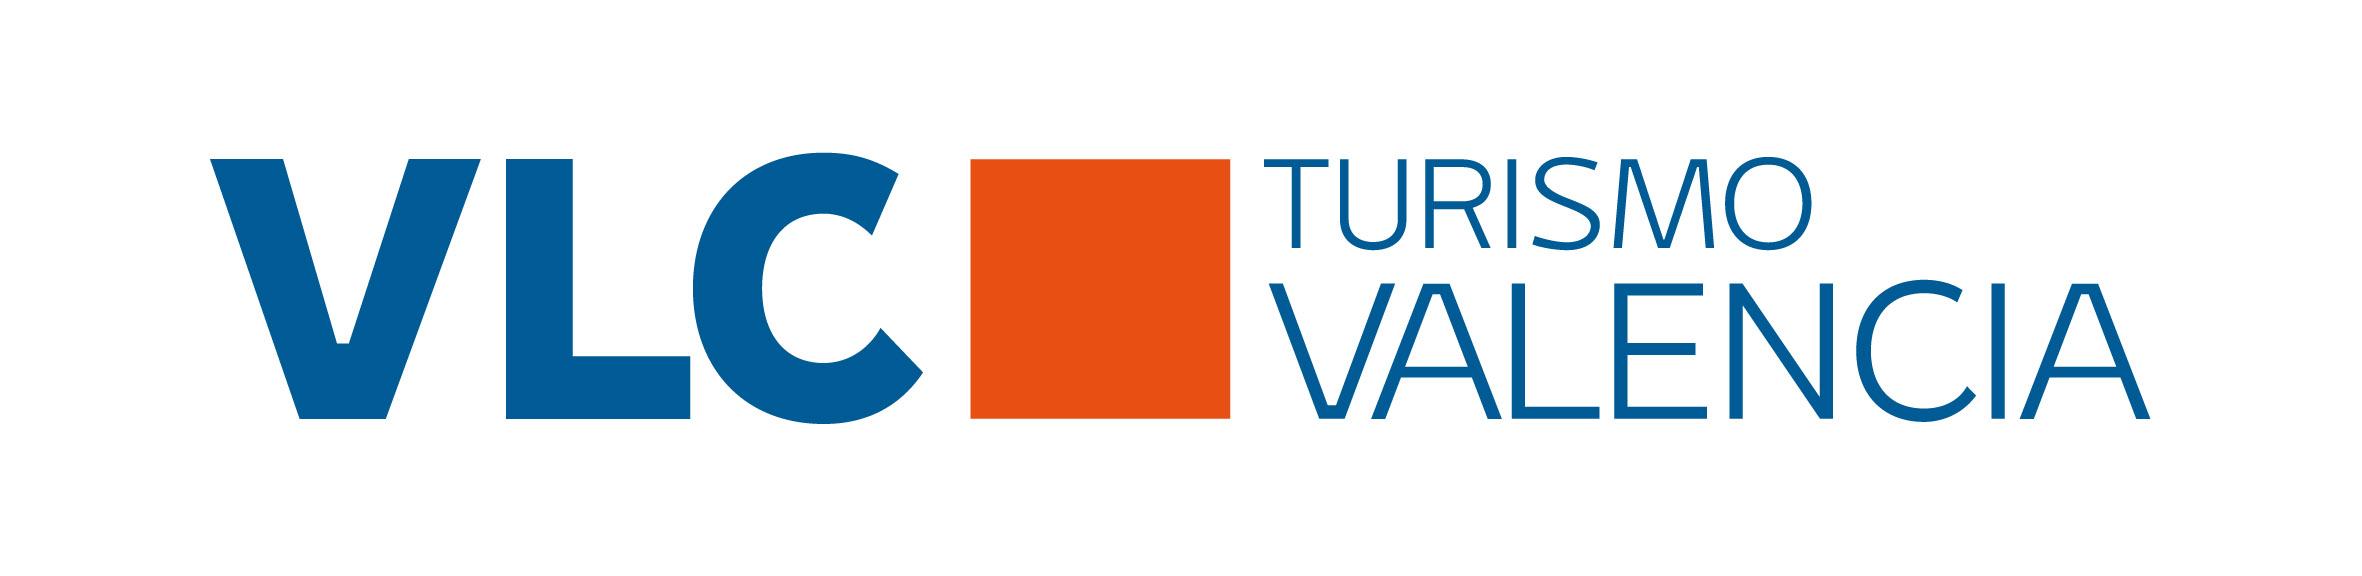 logo_turismovalencia_altaresolucion